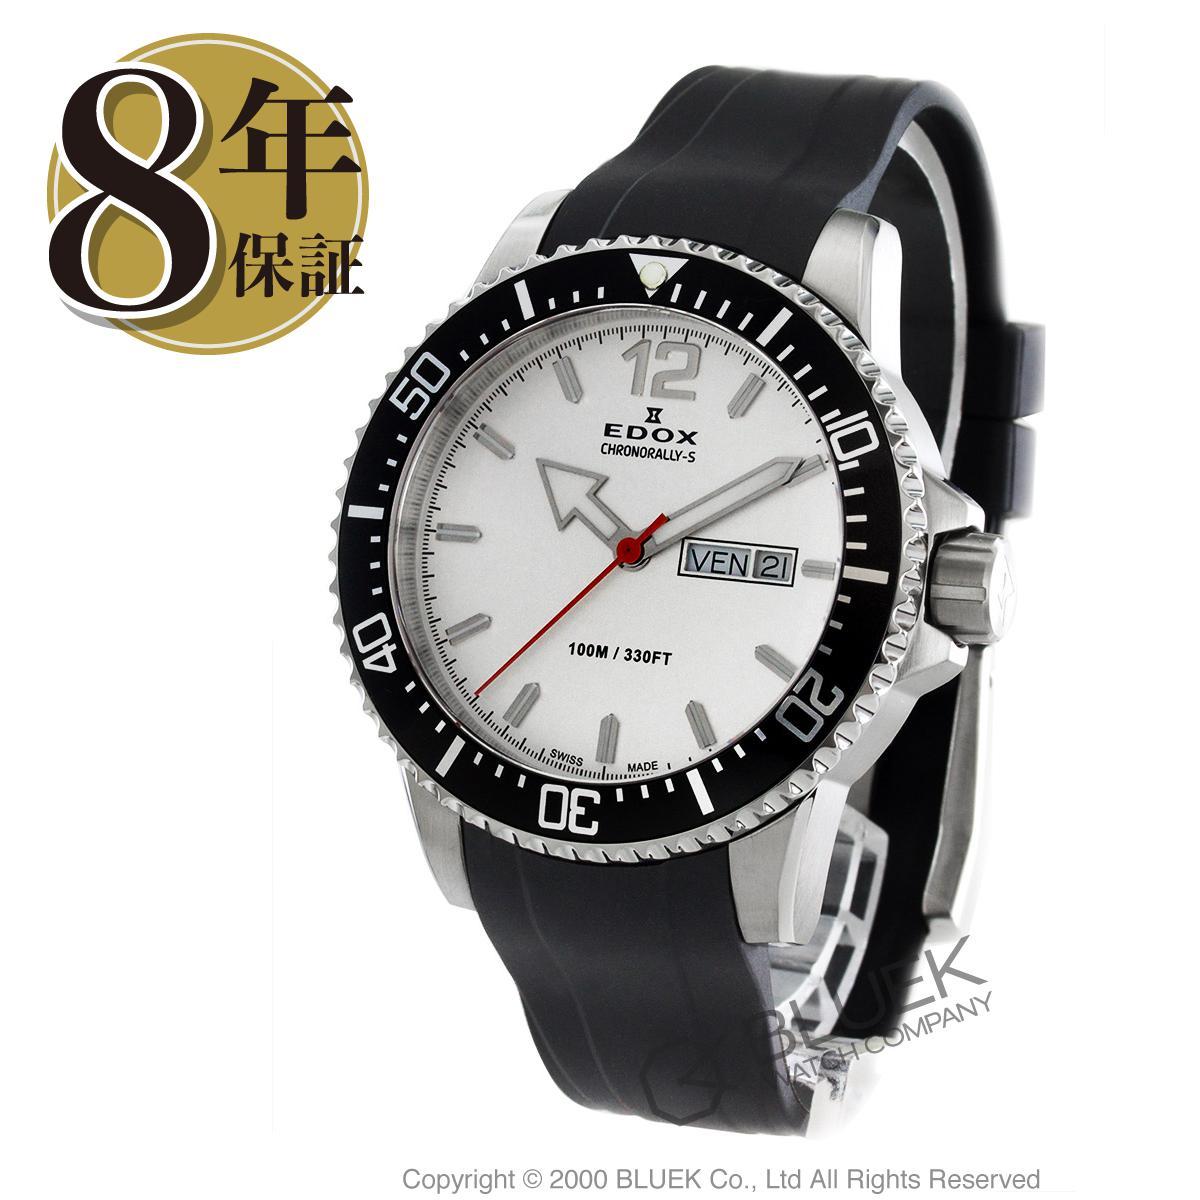 ff71201c6ac0 エドックス クロノラリー S 腕時計 メンズ EDOX 84300-3CA-ABN_8 [送料無料][対応][エドックス ][84300-3CA-ABN][EDOX][時計][新品]